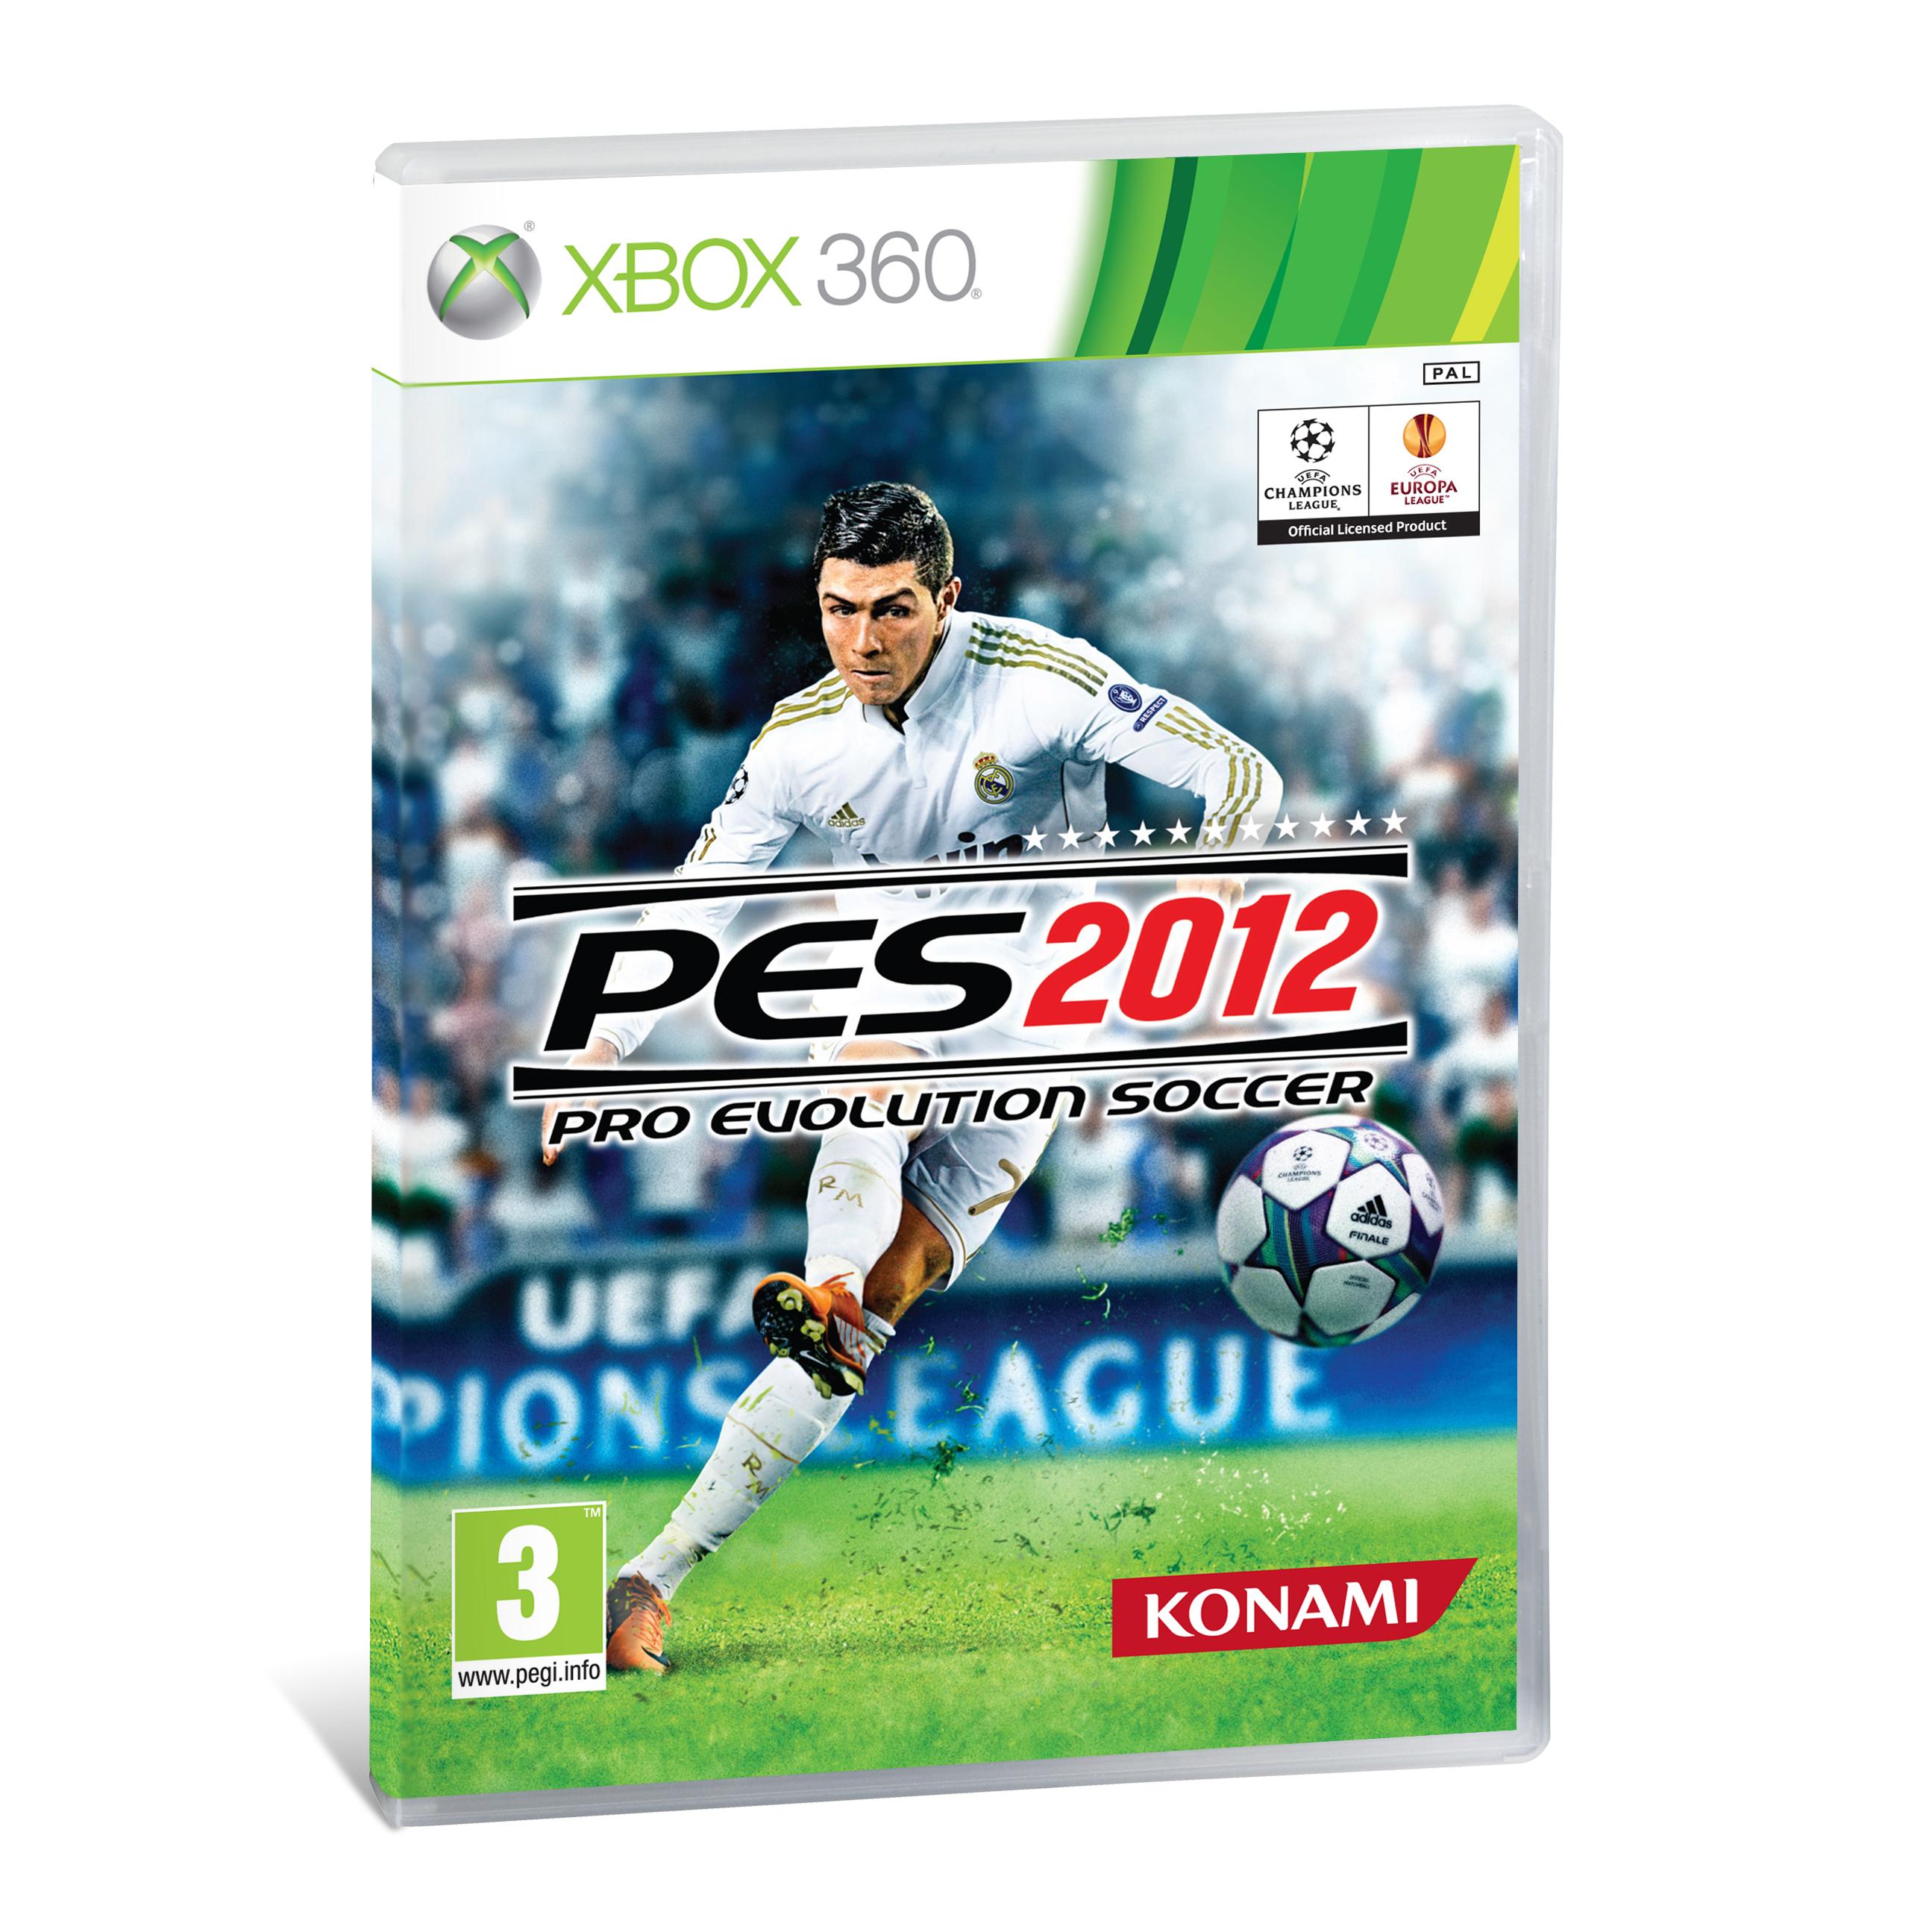 . Pro Evolution Soccer 2012